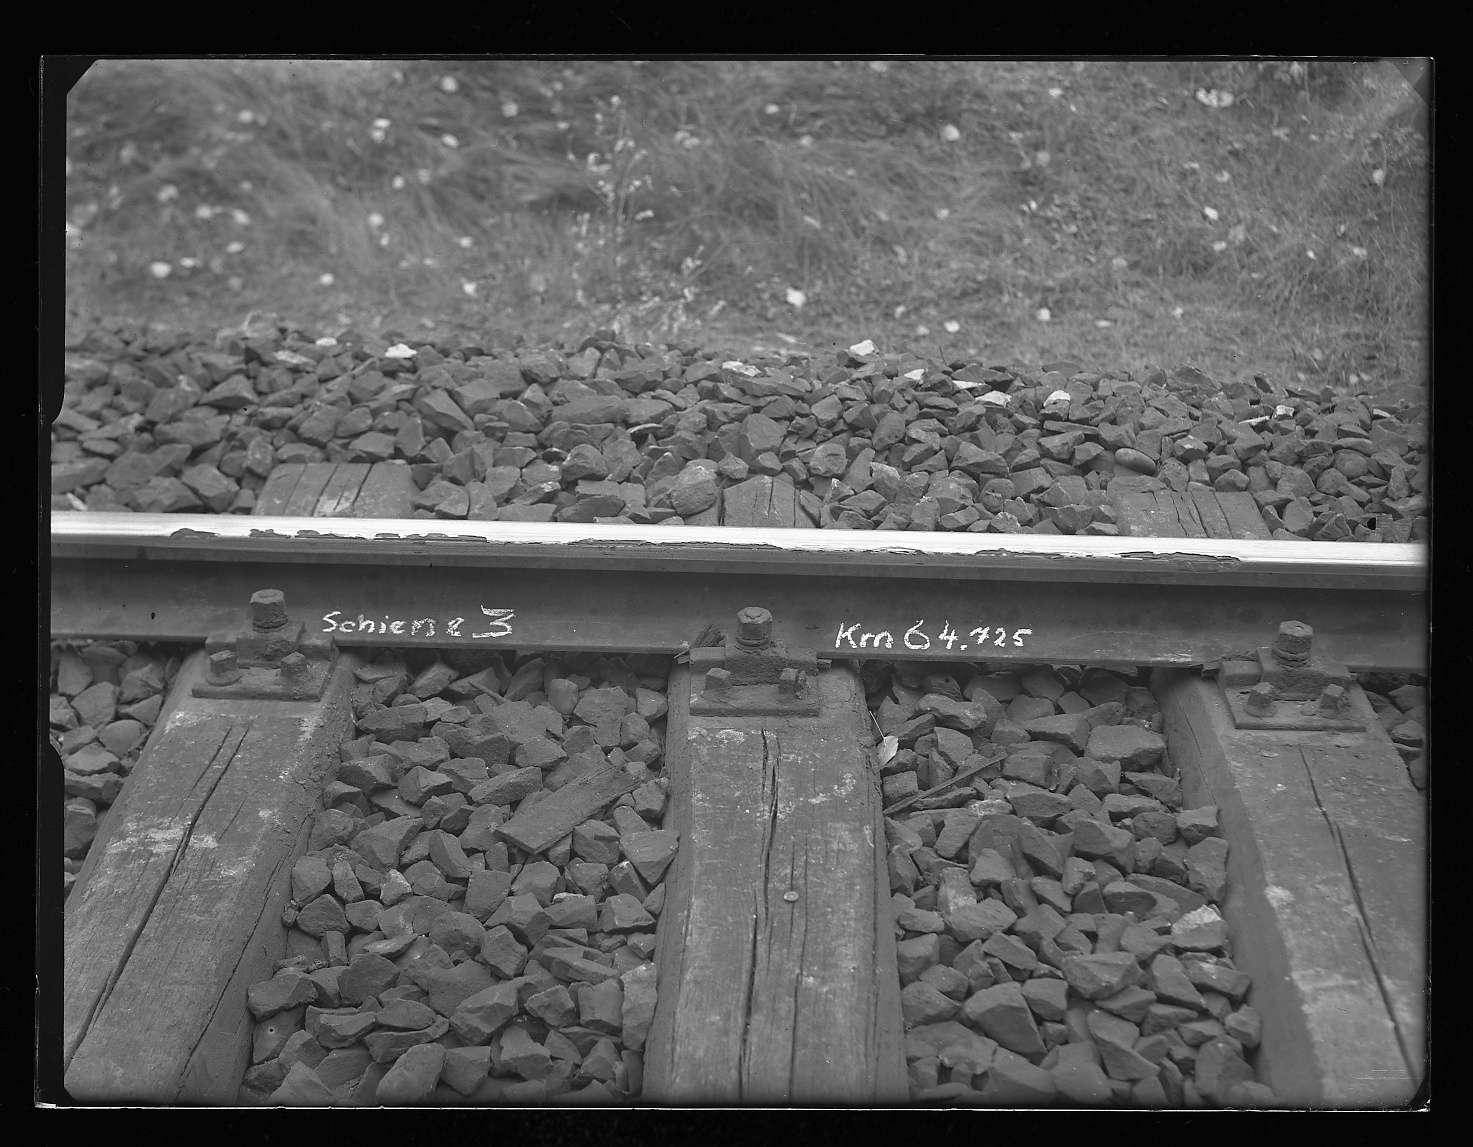 Geislingen an der Steige, Bf, Schienenbeschädigungen (km 62+040, 64+725), Abb. a